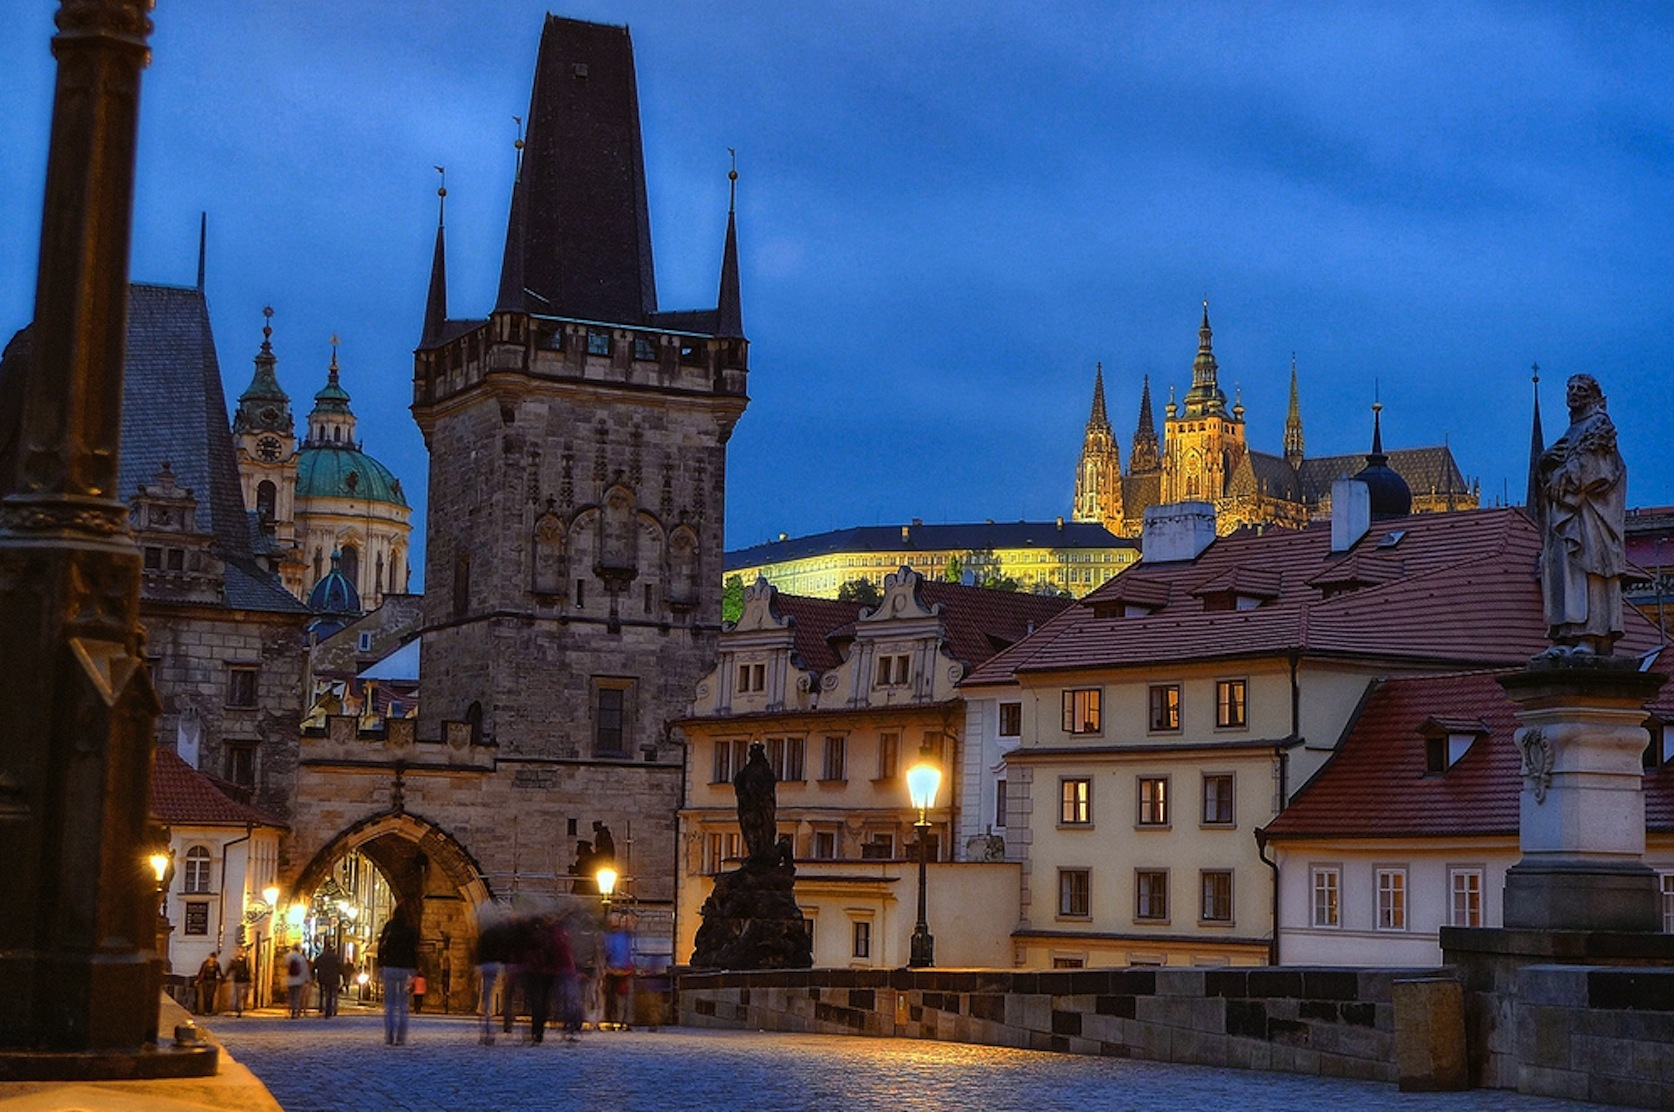 Ciudades europeas, Praga